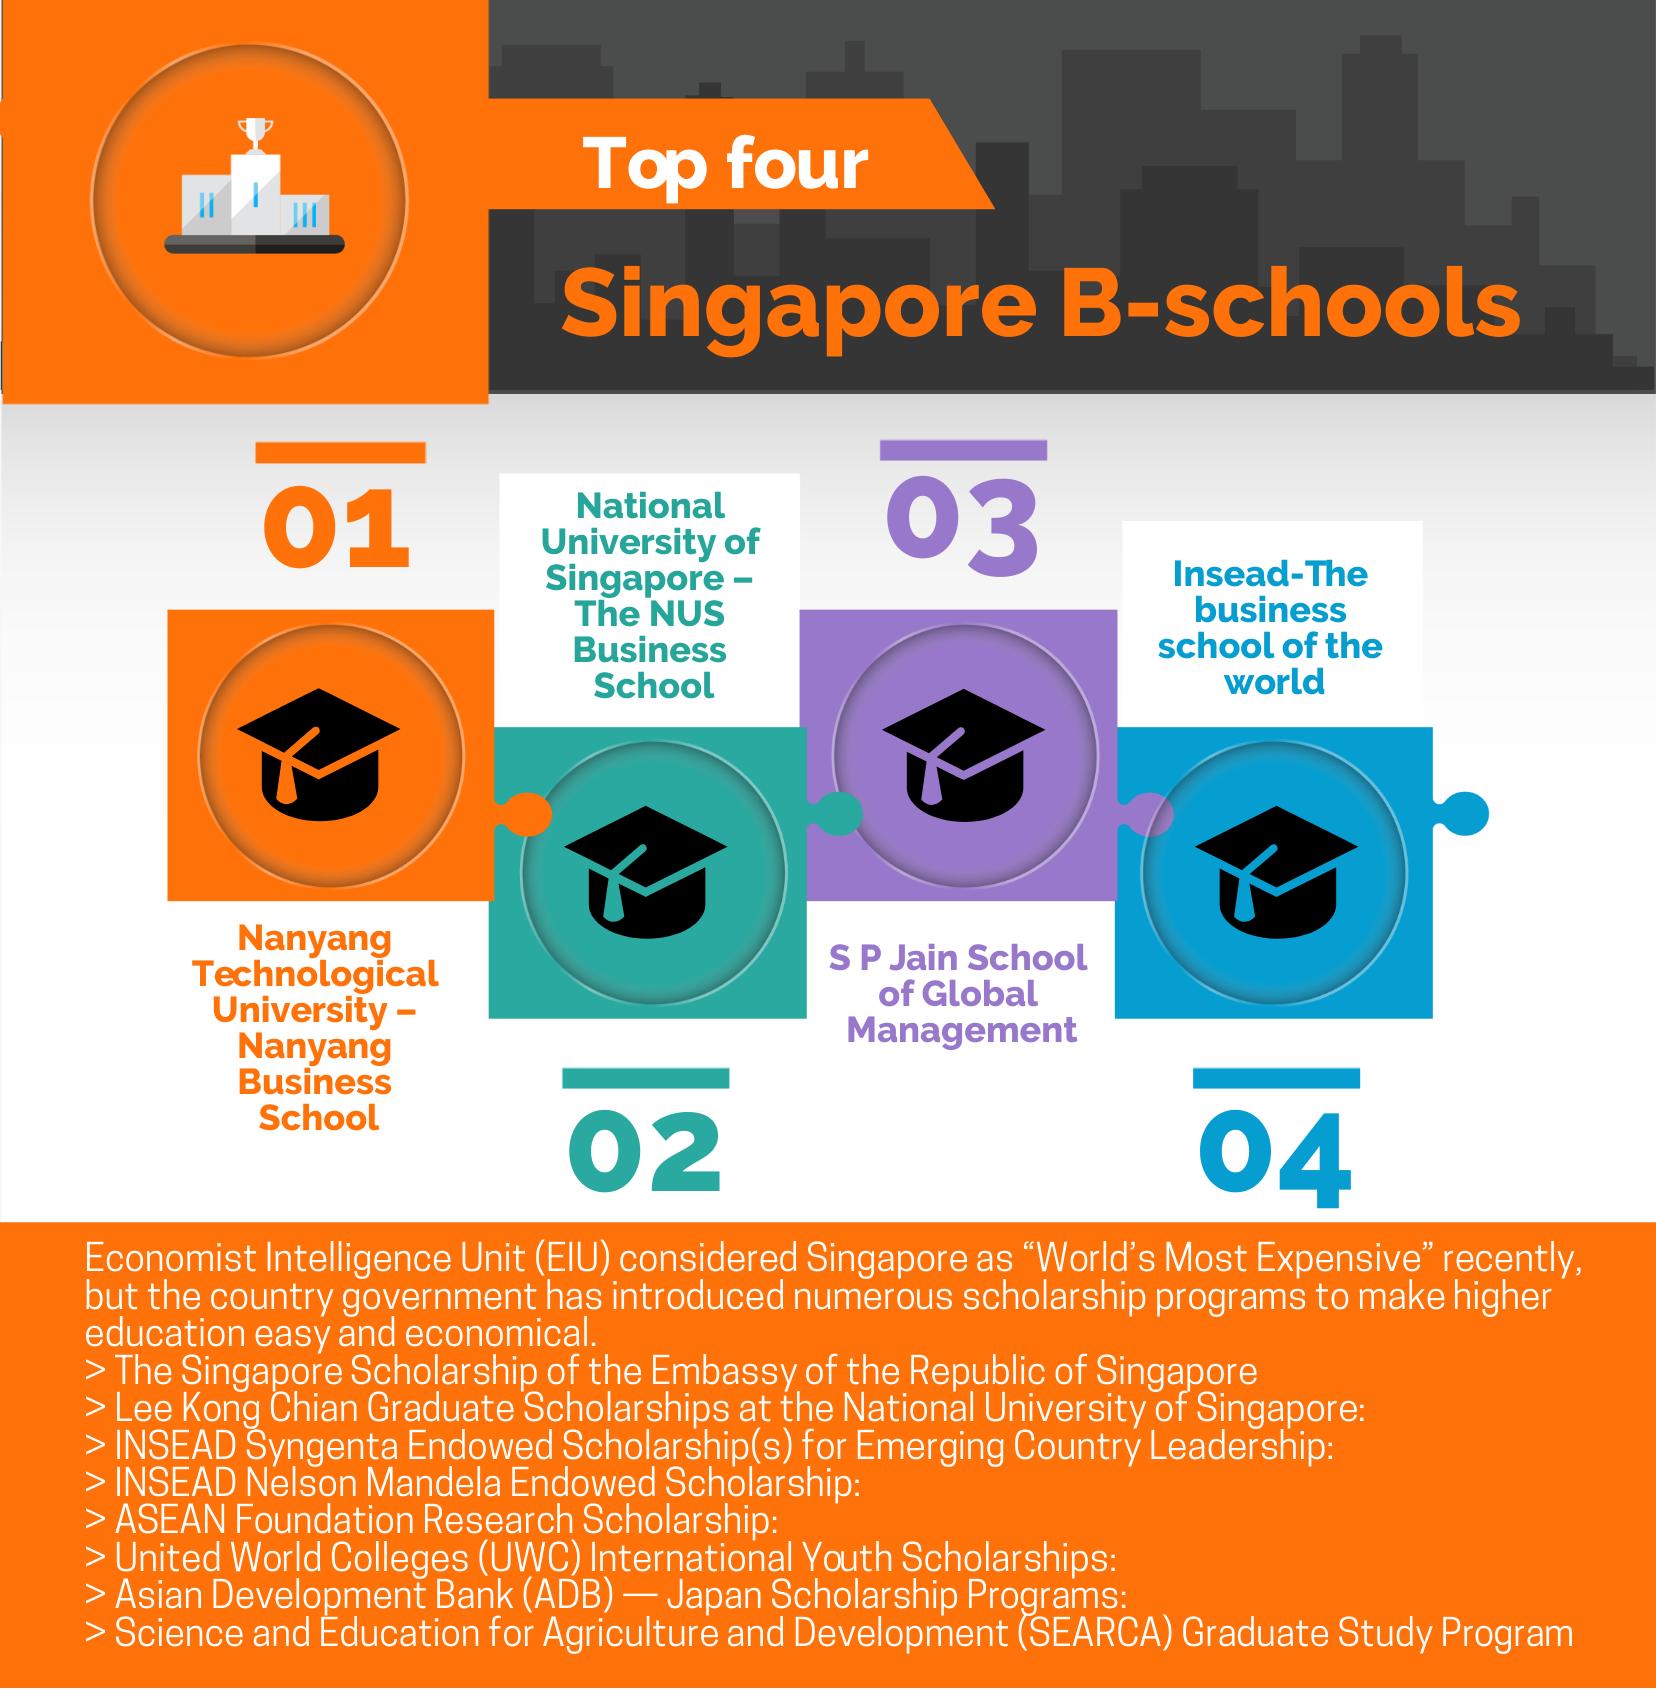 Singapore B-schools with Minimum GMAT Score